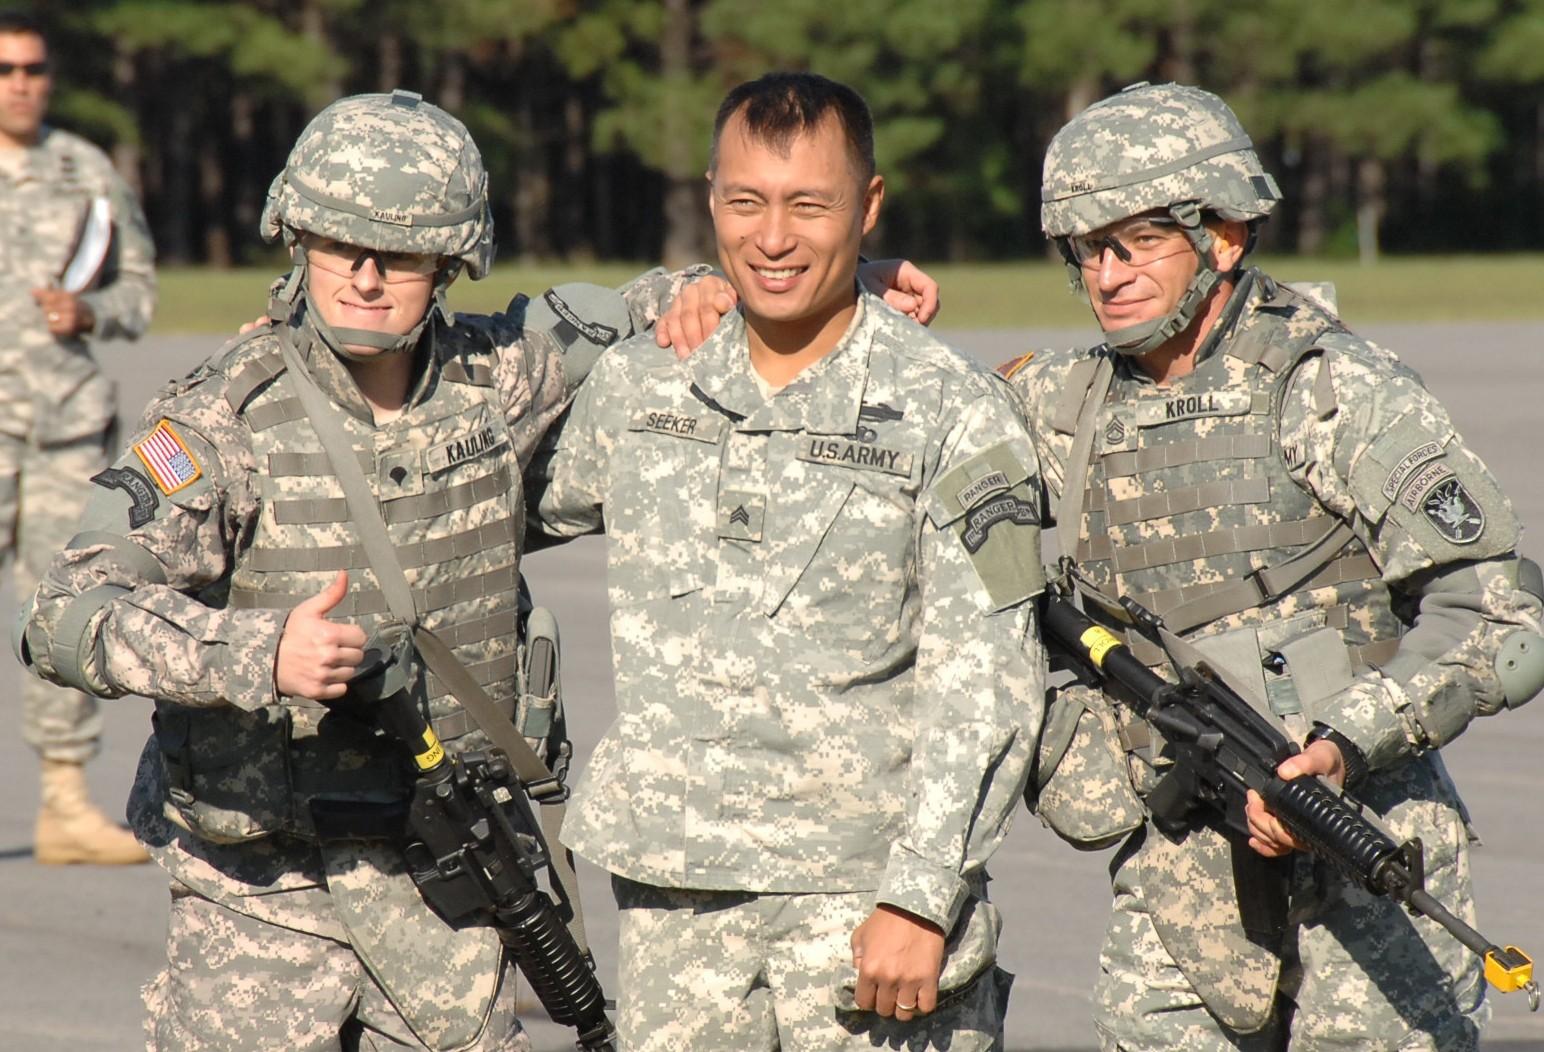 Army mil 2008 10 04 114440